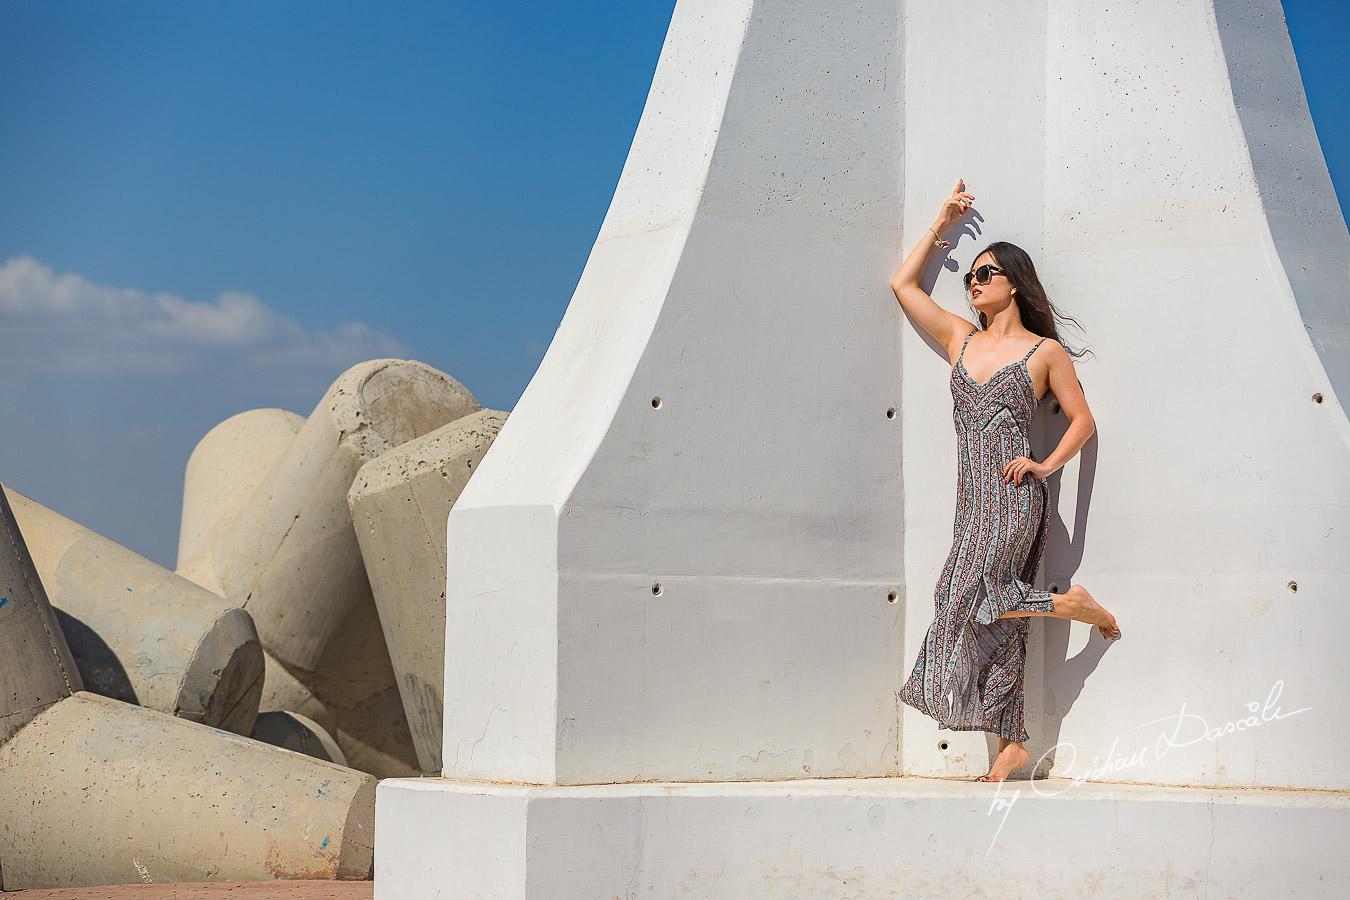 Hongzhen posing like a model in Zygi, Cyprus. Photographer: Cristian Dascalu